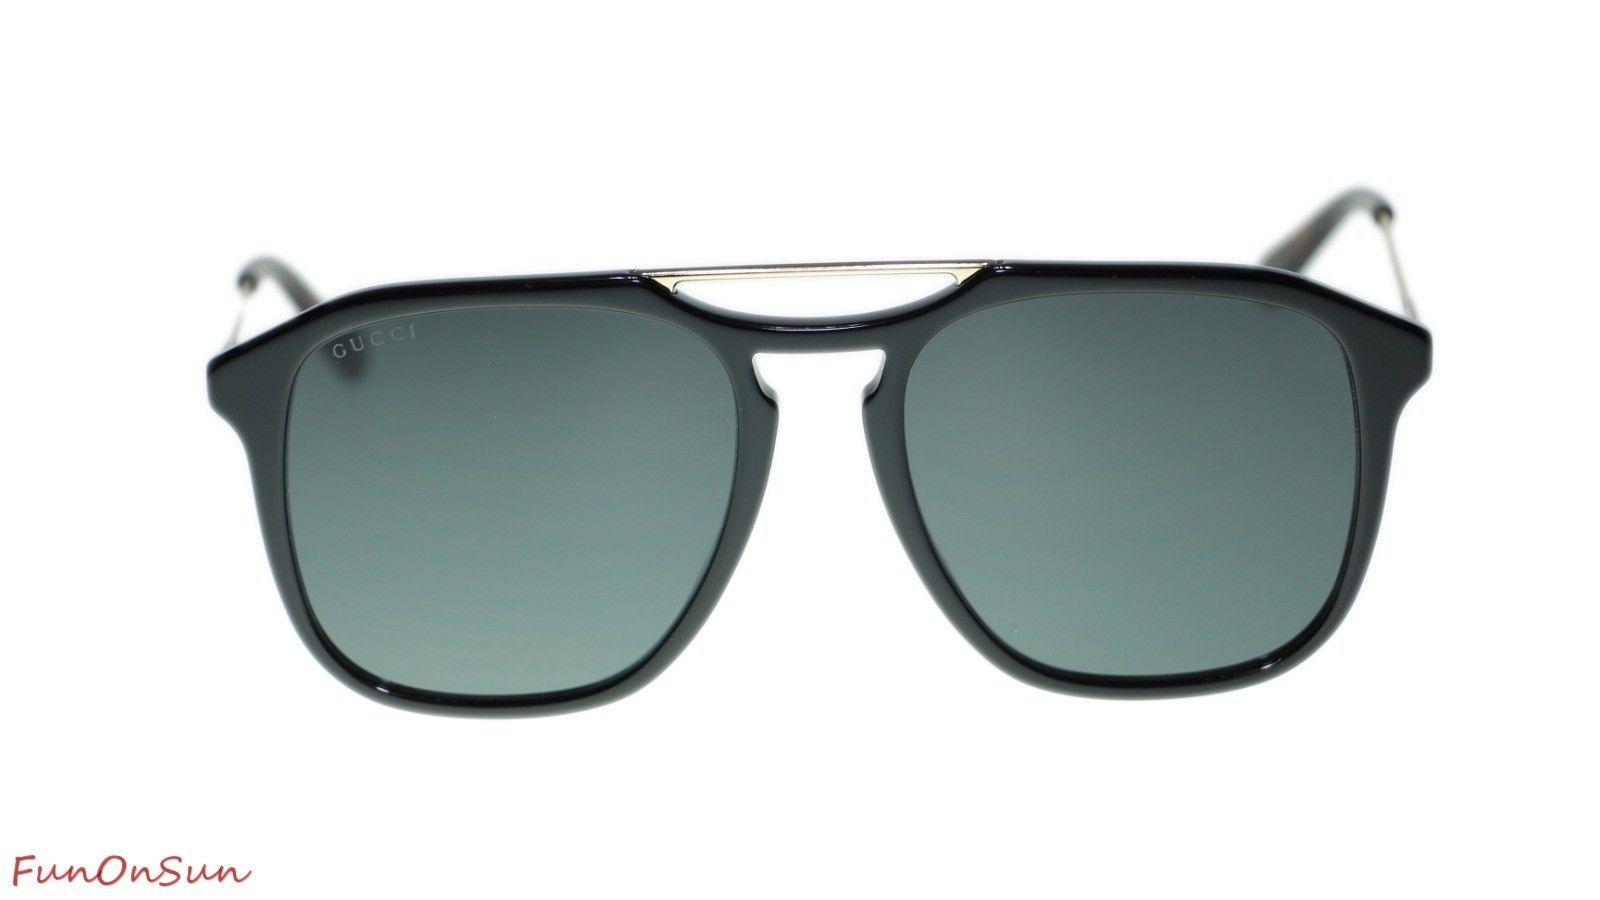 ef539df4d27e NEW Gucci Sunglasses GG0321S 001 Black Gold Grey Lens Square 55mm Authentic  - $212.43